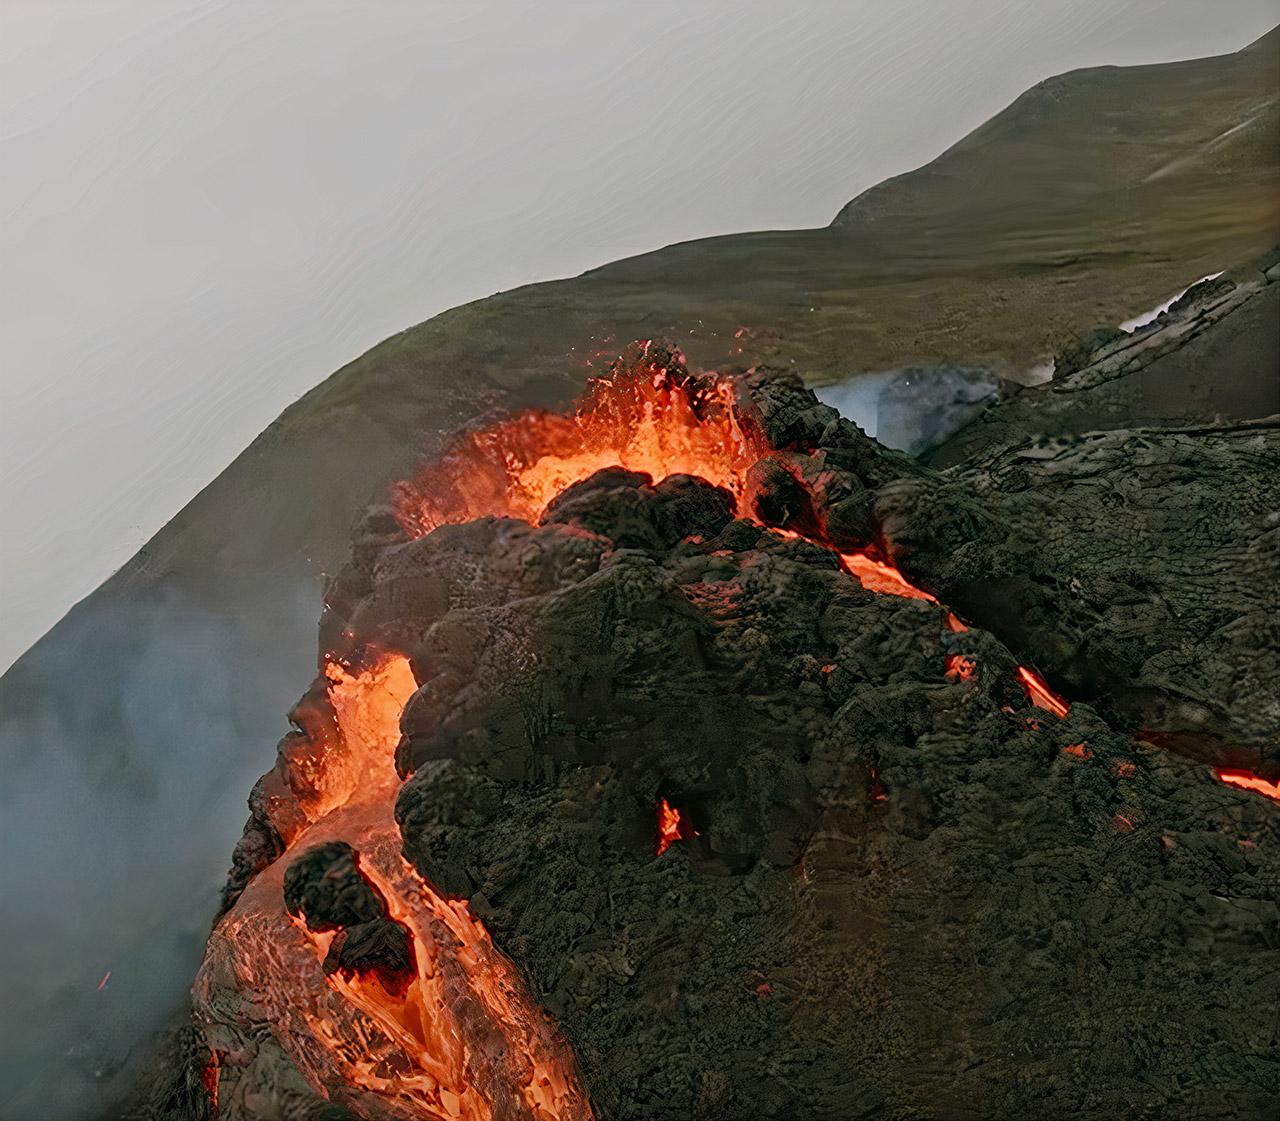 DJI FPV Drone Iceland Fagradalsfjal Volcano Eruption